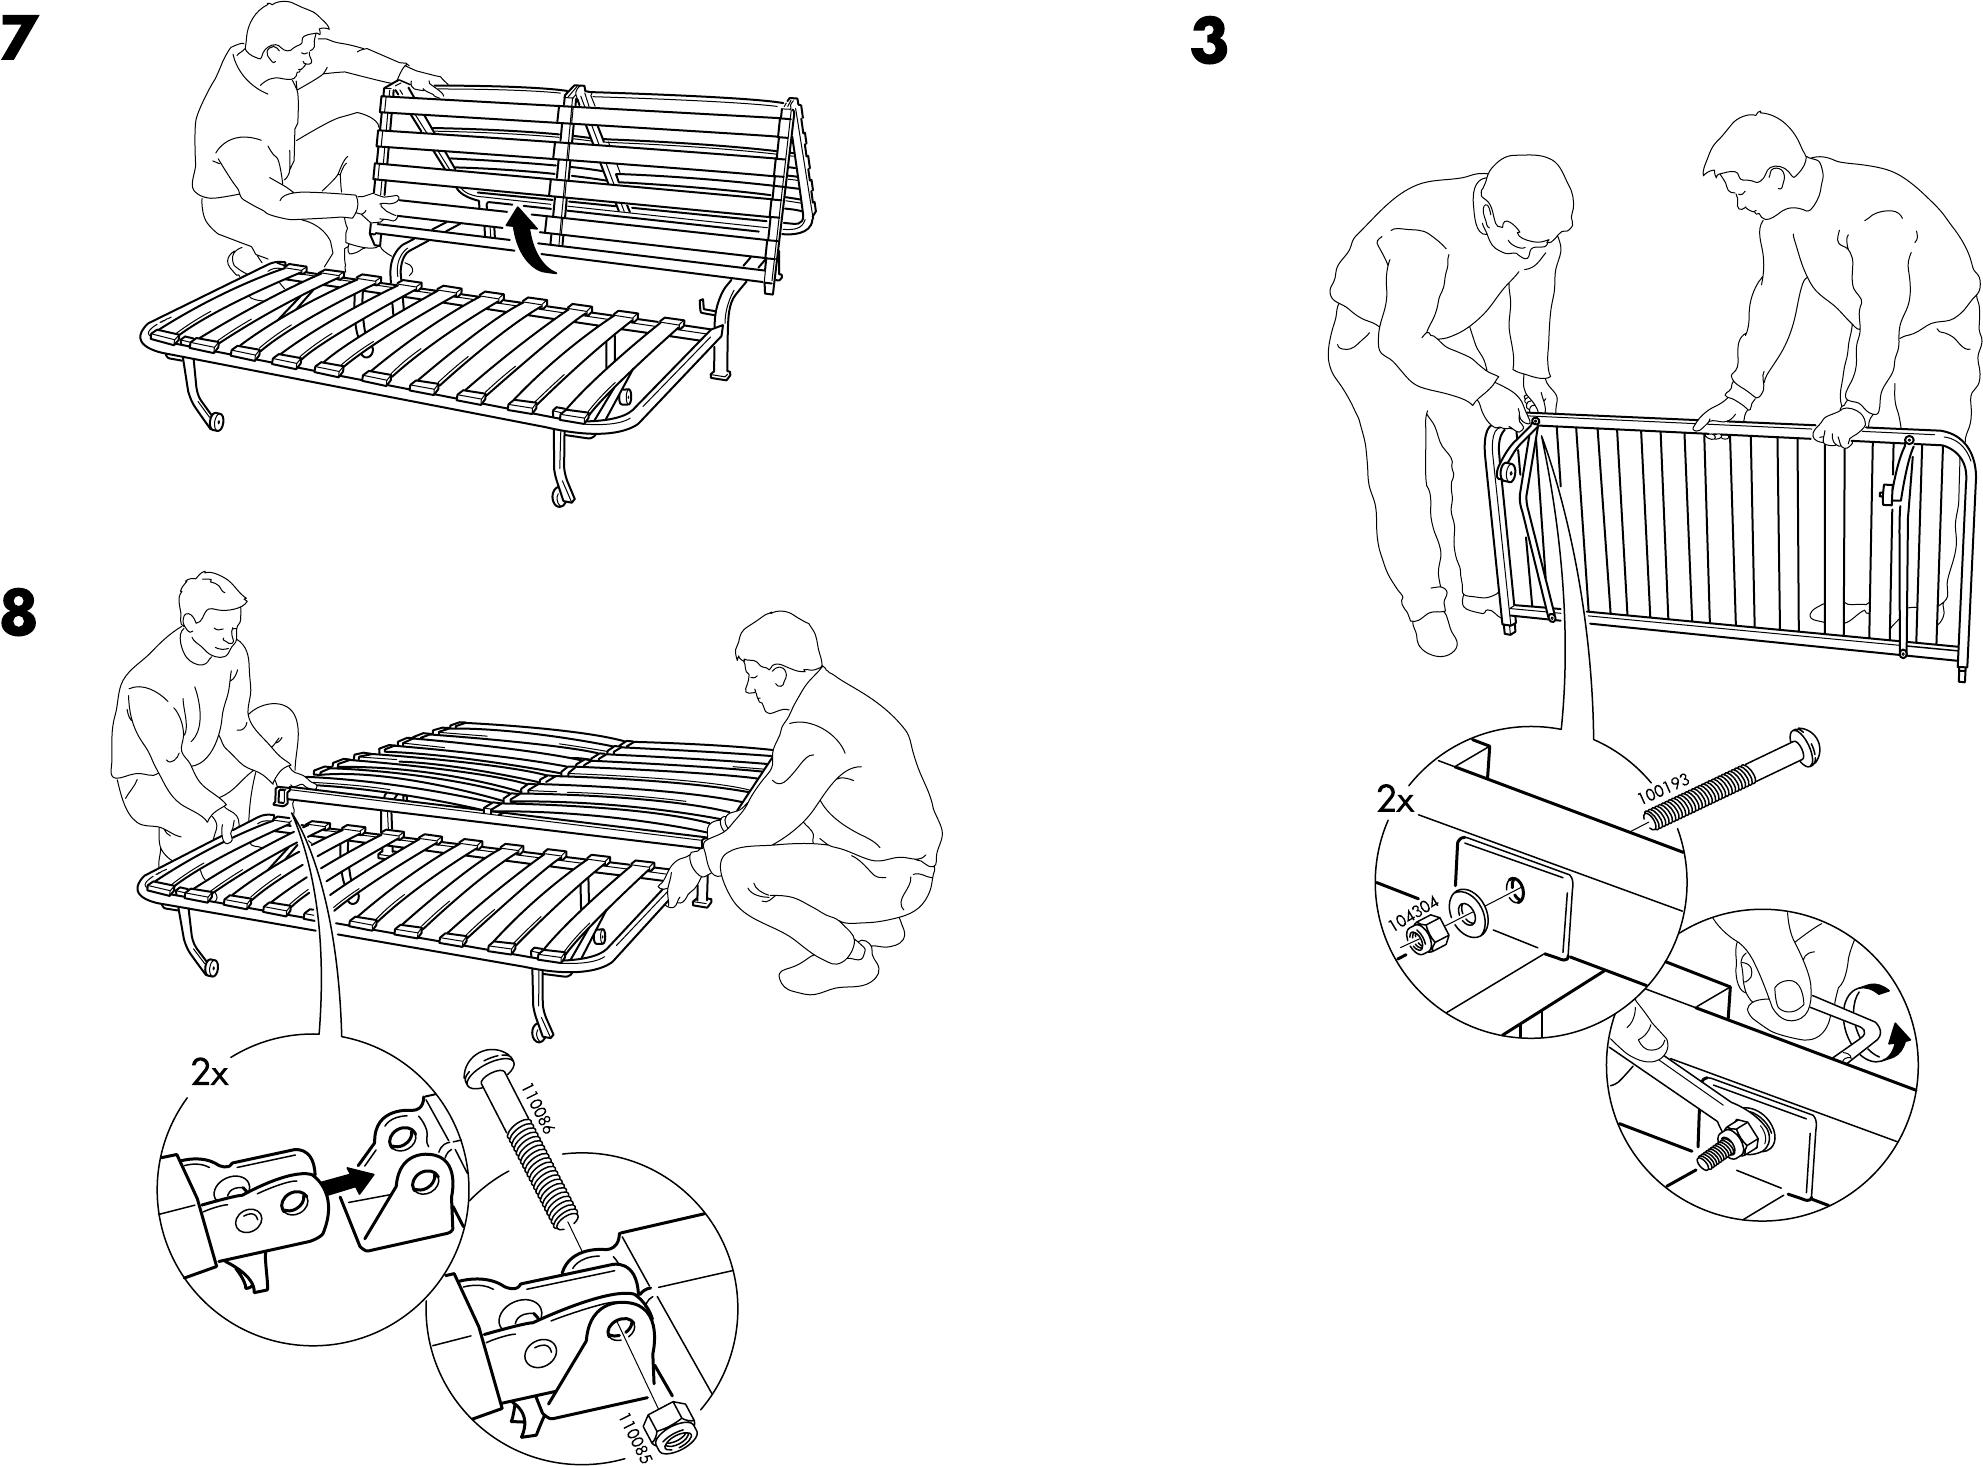 Lyksele Slaapbank Ikea.Handleiding Ikea Lycksele Onderstel Slaapbank Pagina 5 Van 6